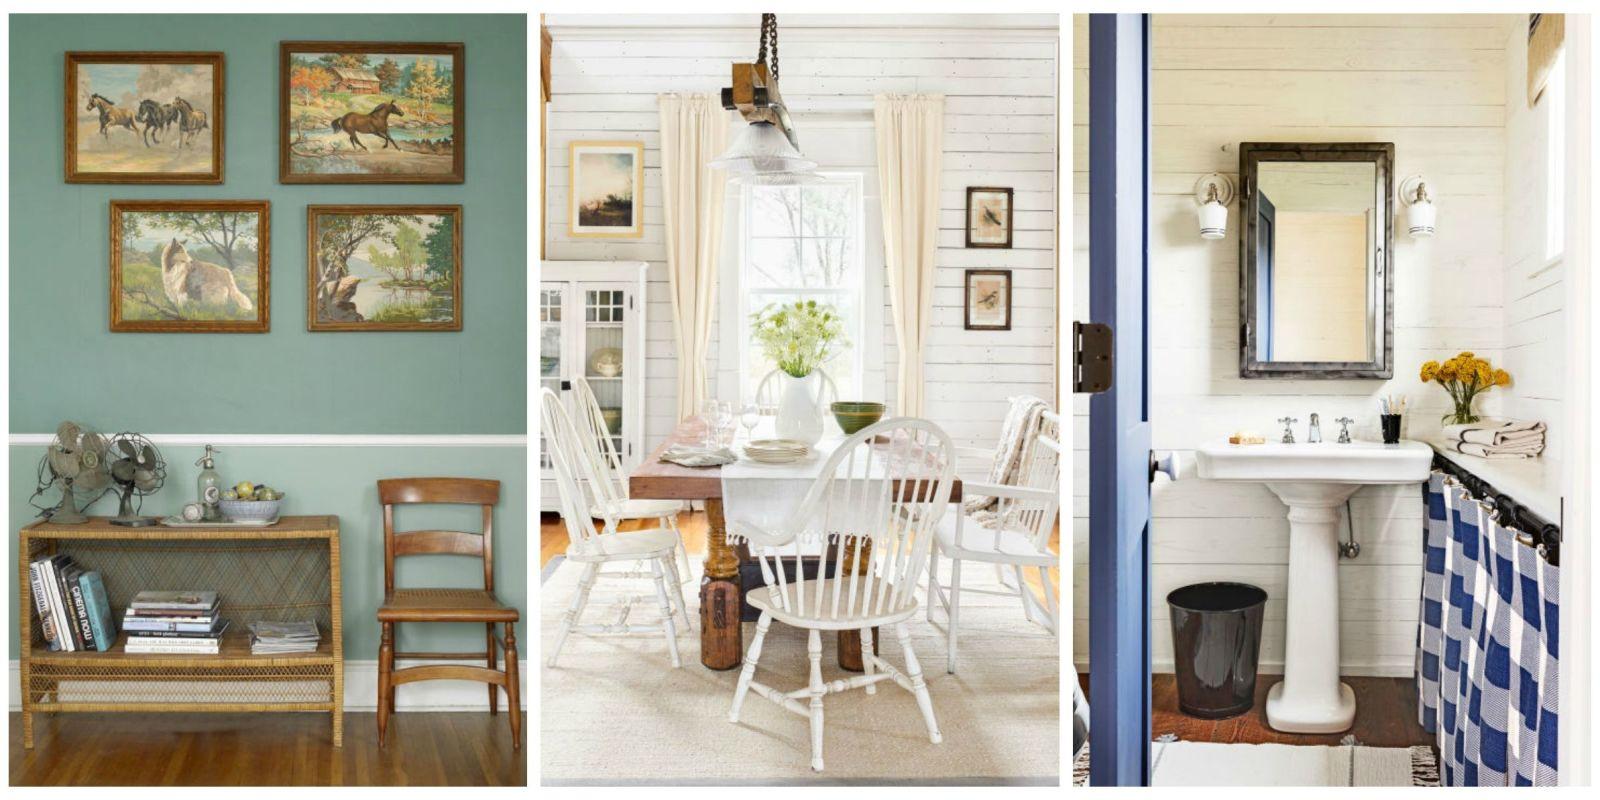 30+ Inexpensive Decorating Ideas